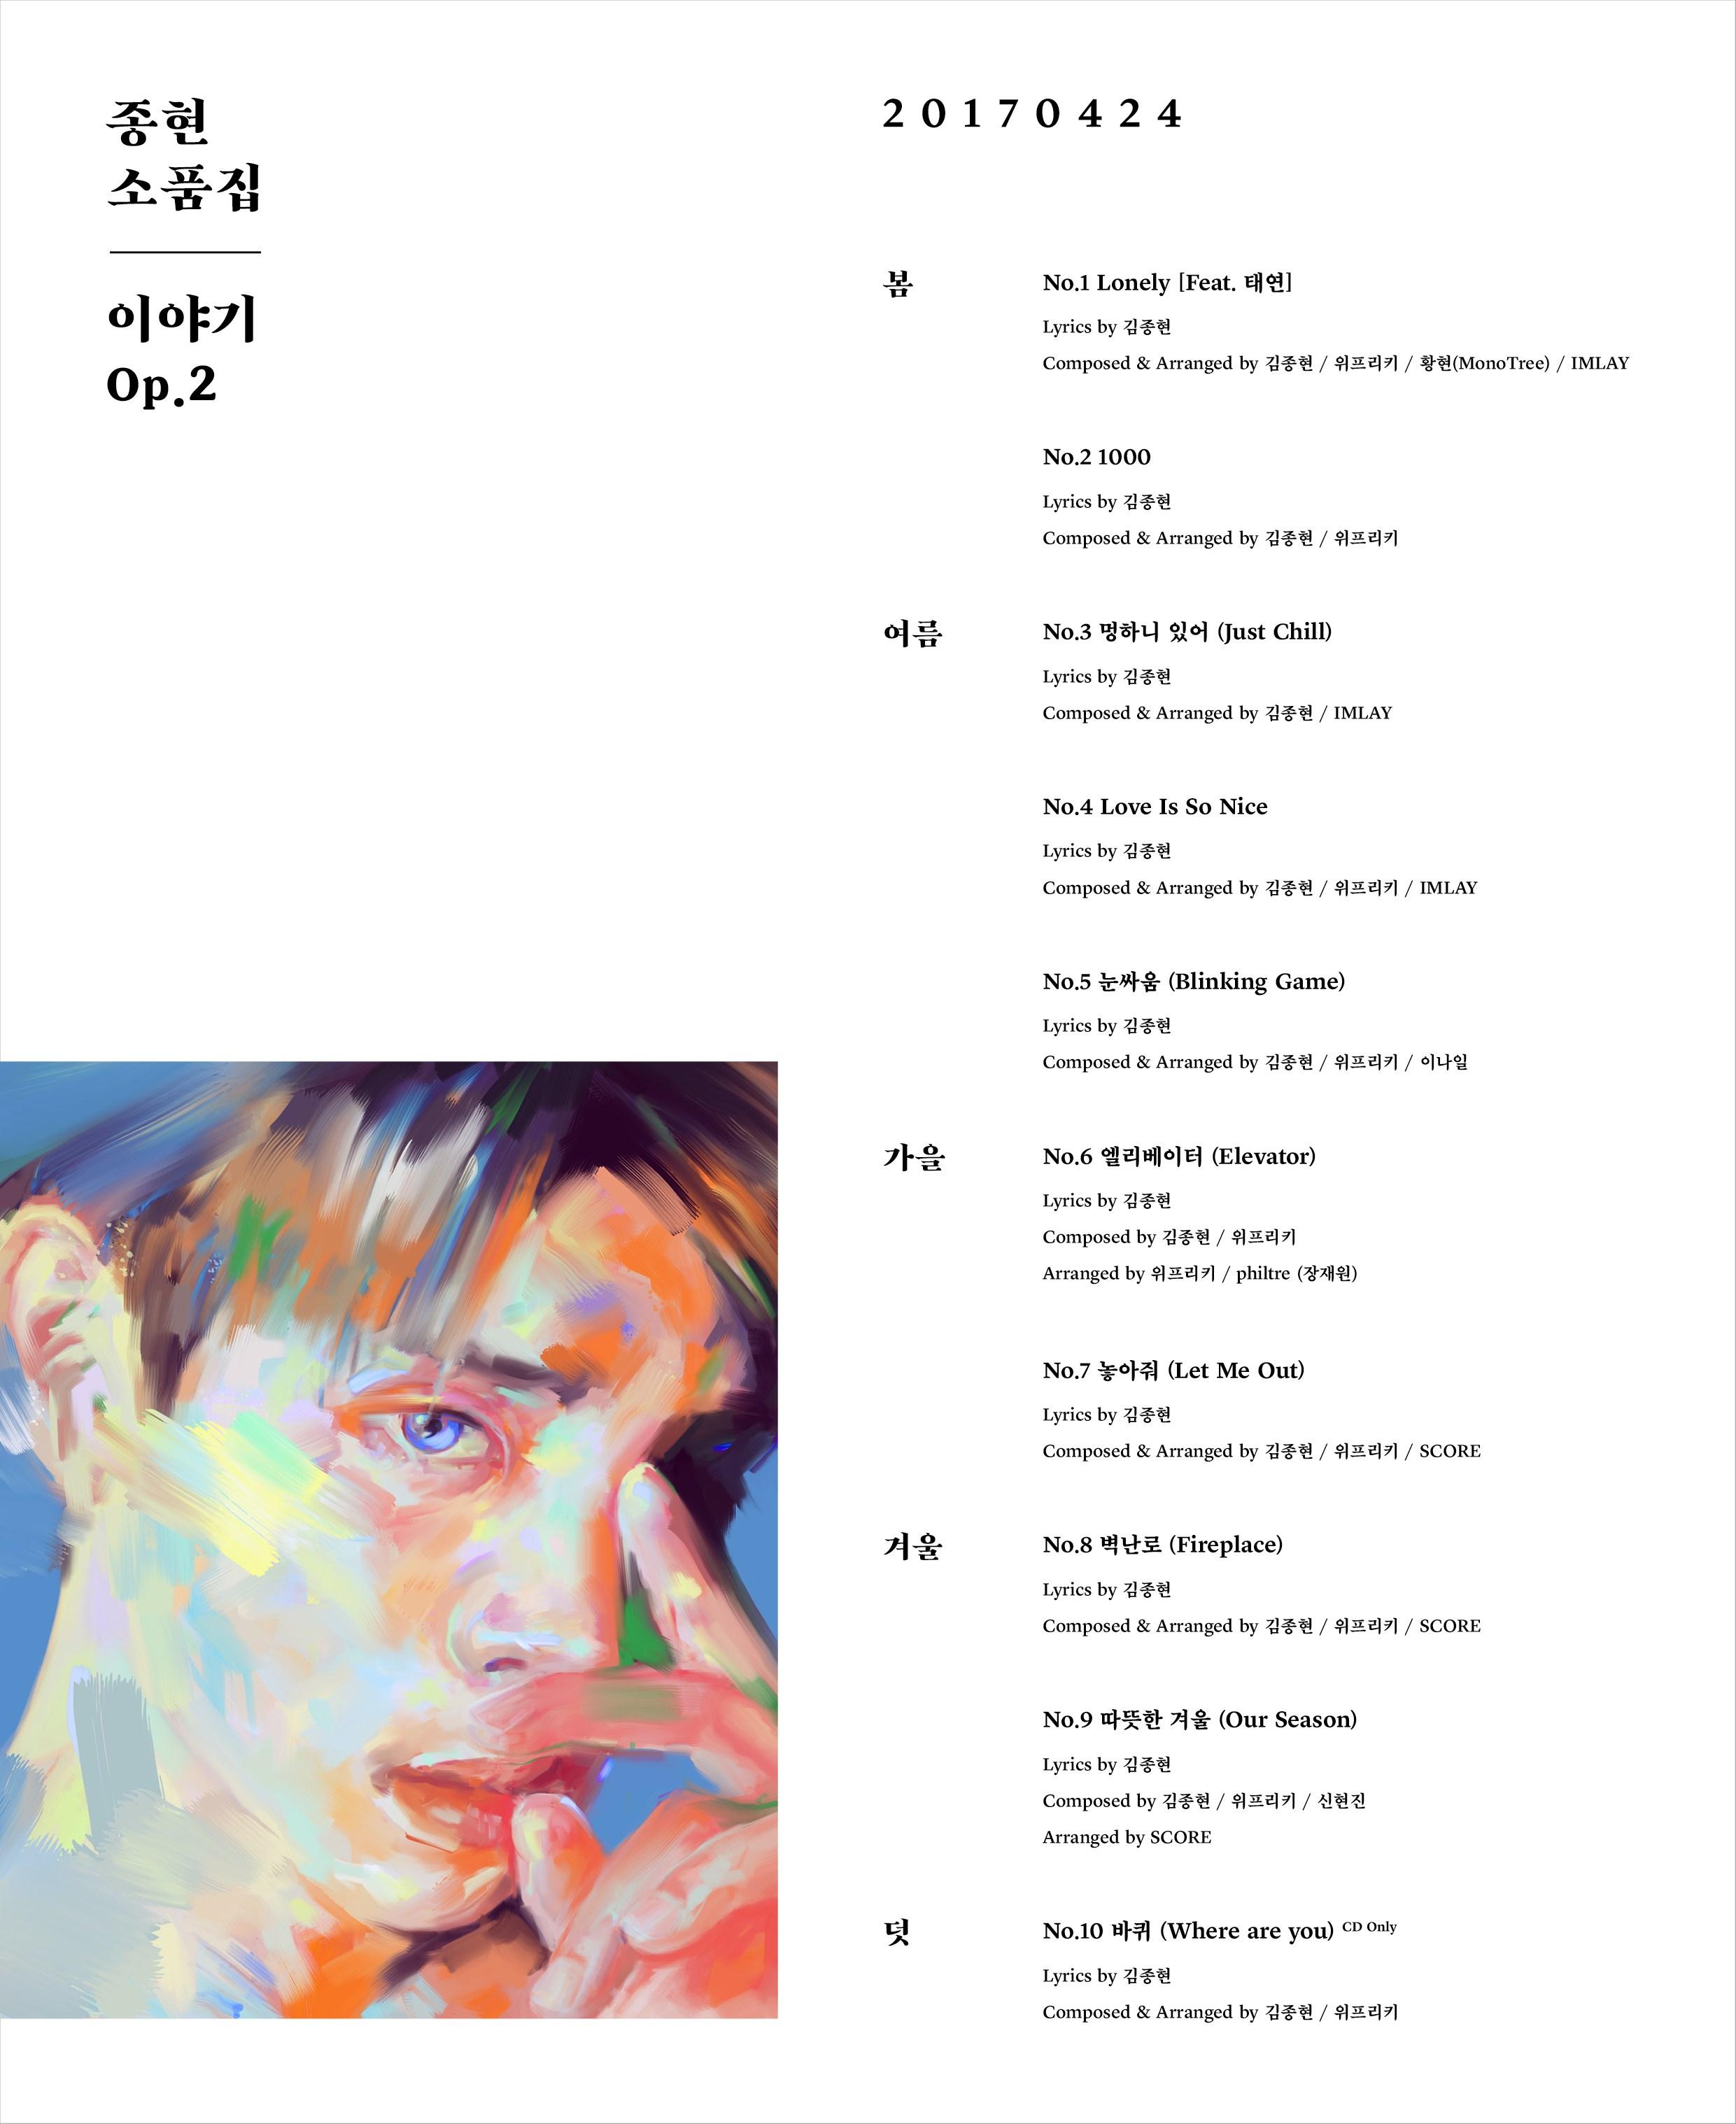 [tracklist]jonghyun-story